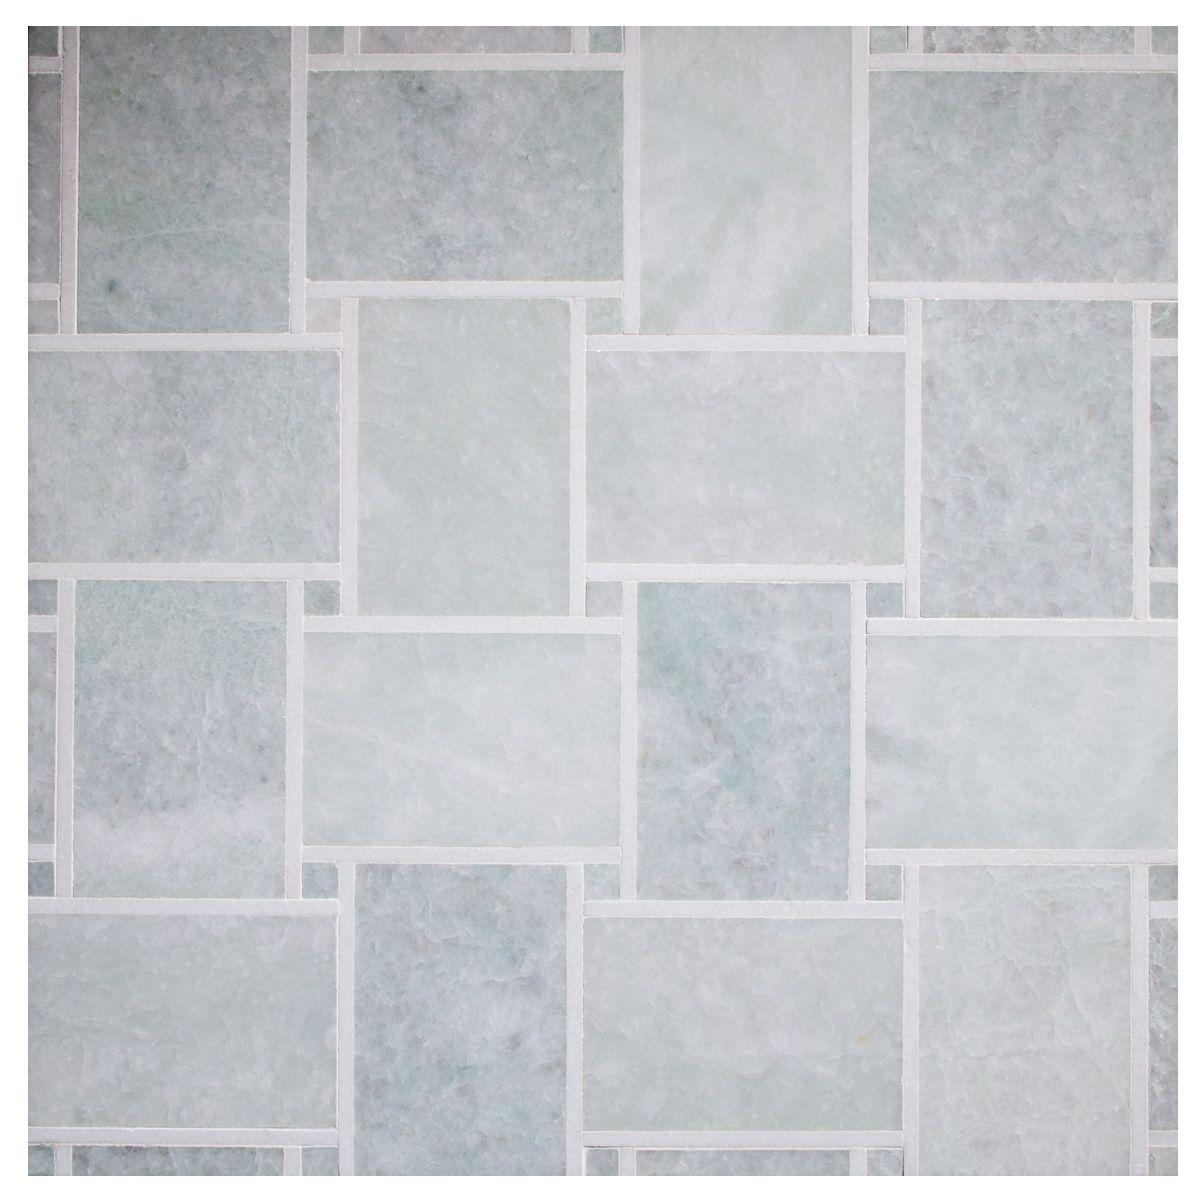 Complete Tile Collection Mosaic Tile Patterns, Large Basketweave ...